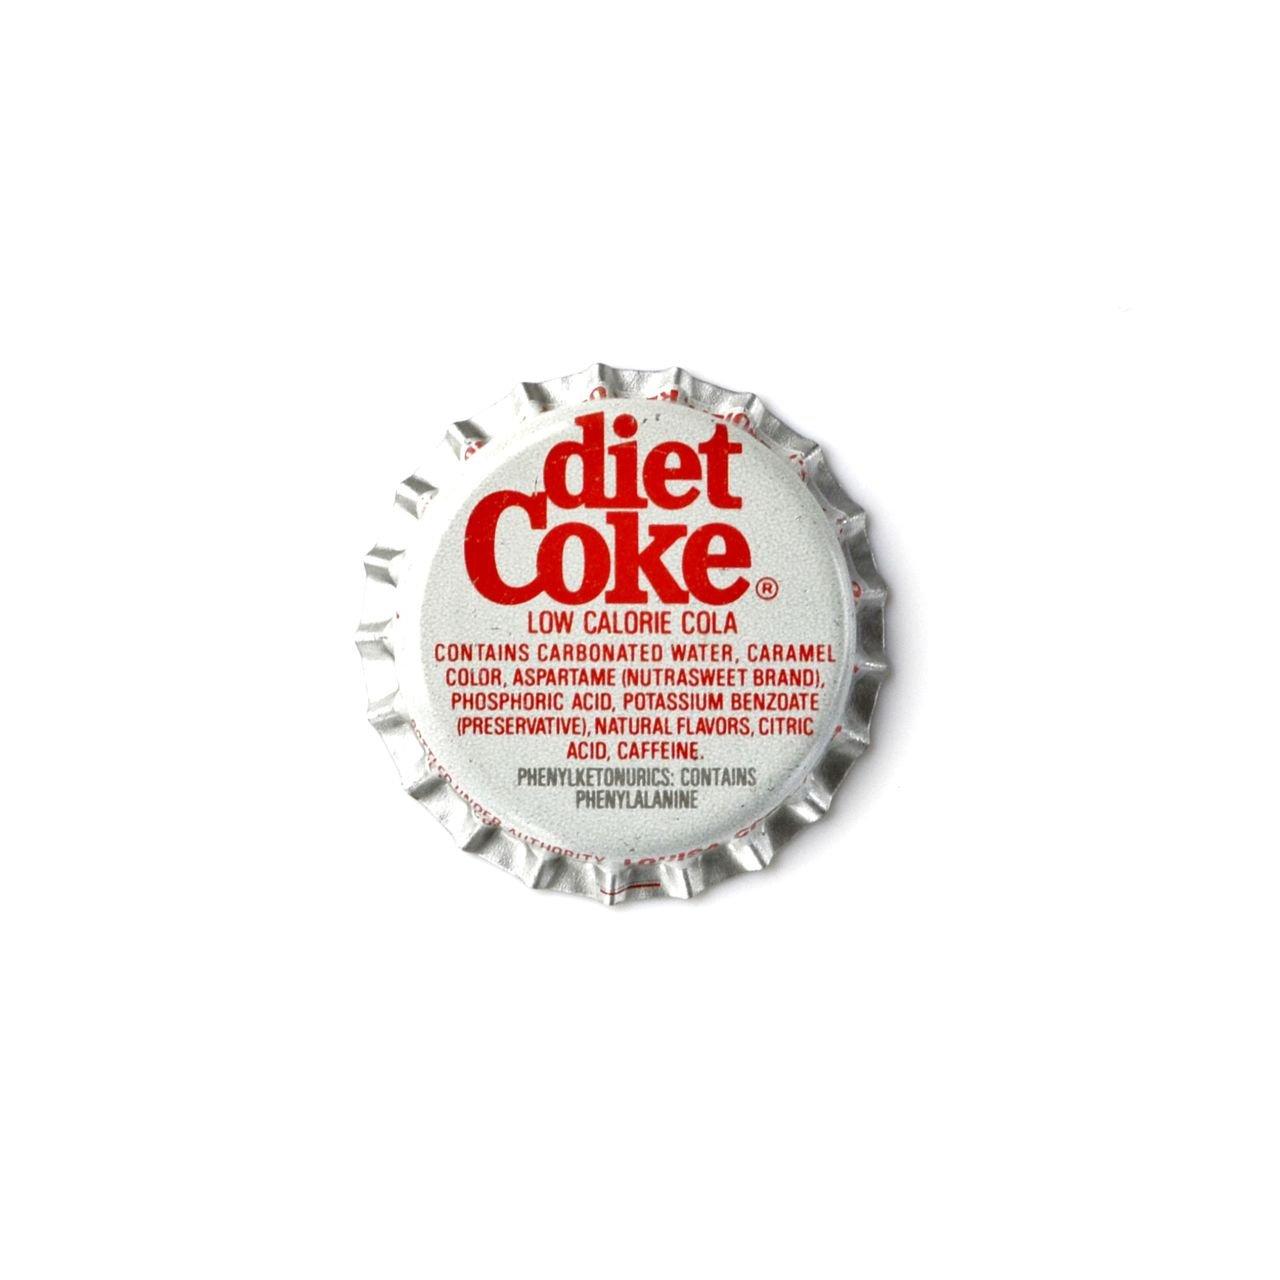 Quality Handcrafts Guaranteed Diet Coke Bottle Cap Lapel Pin